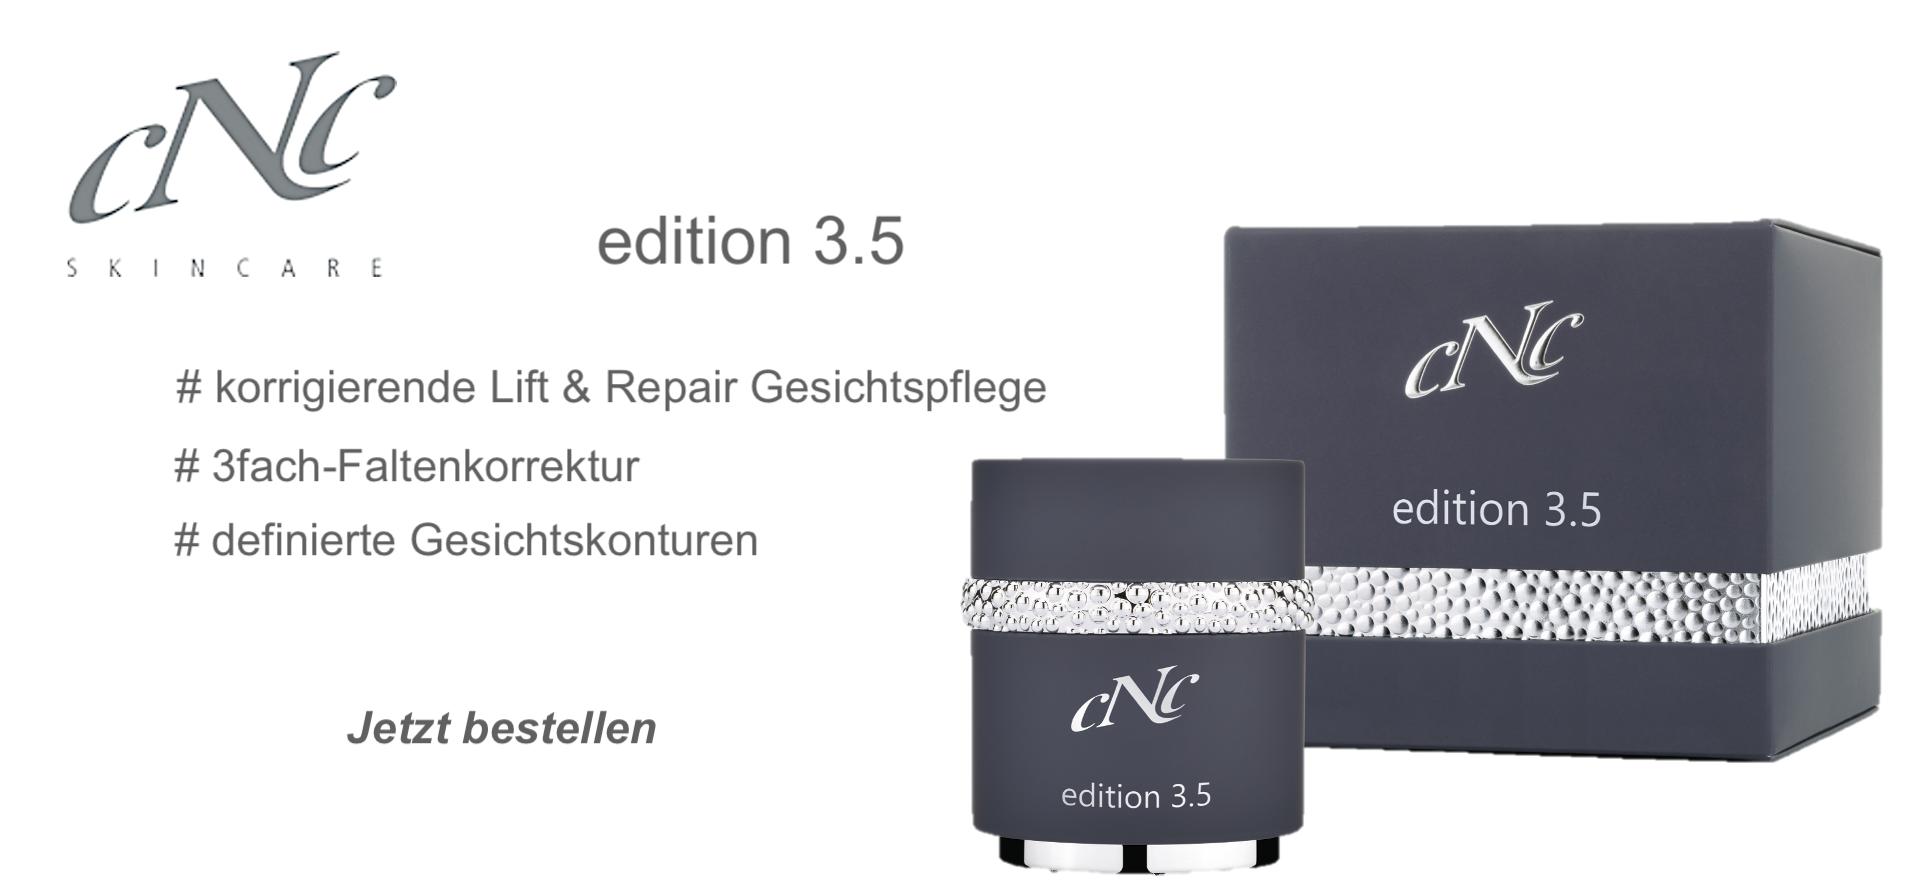 CNC Cosmetic Edition 3.5 Gesichtspflege Lift & Repair 50ml